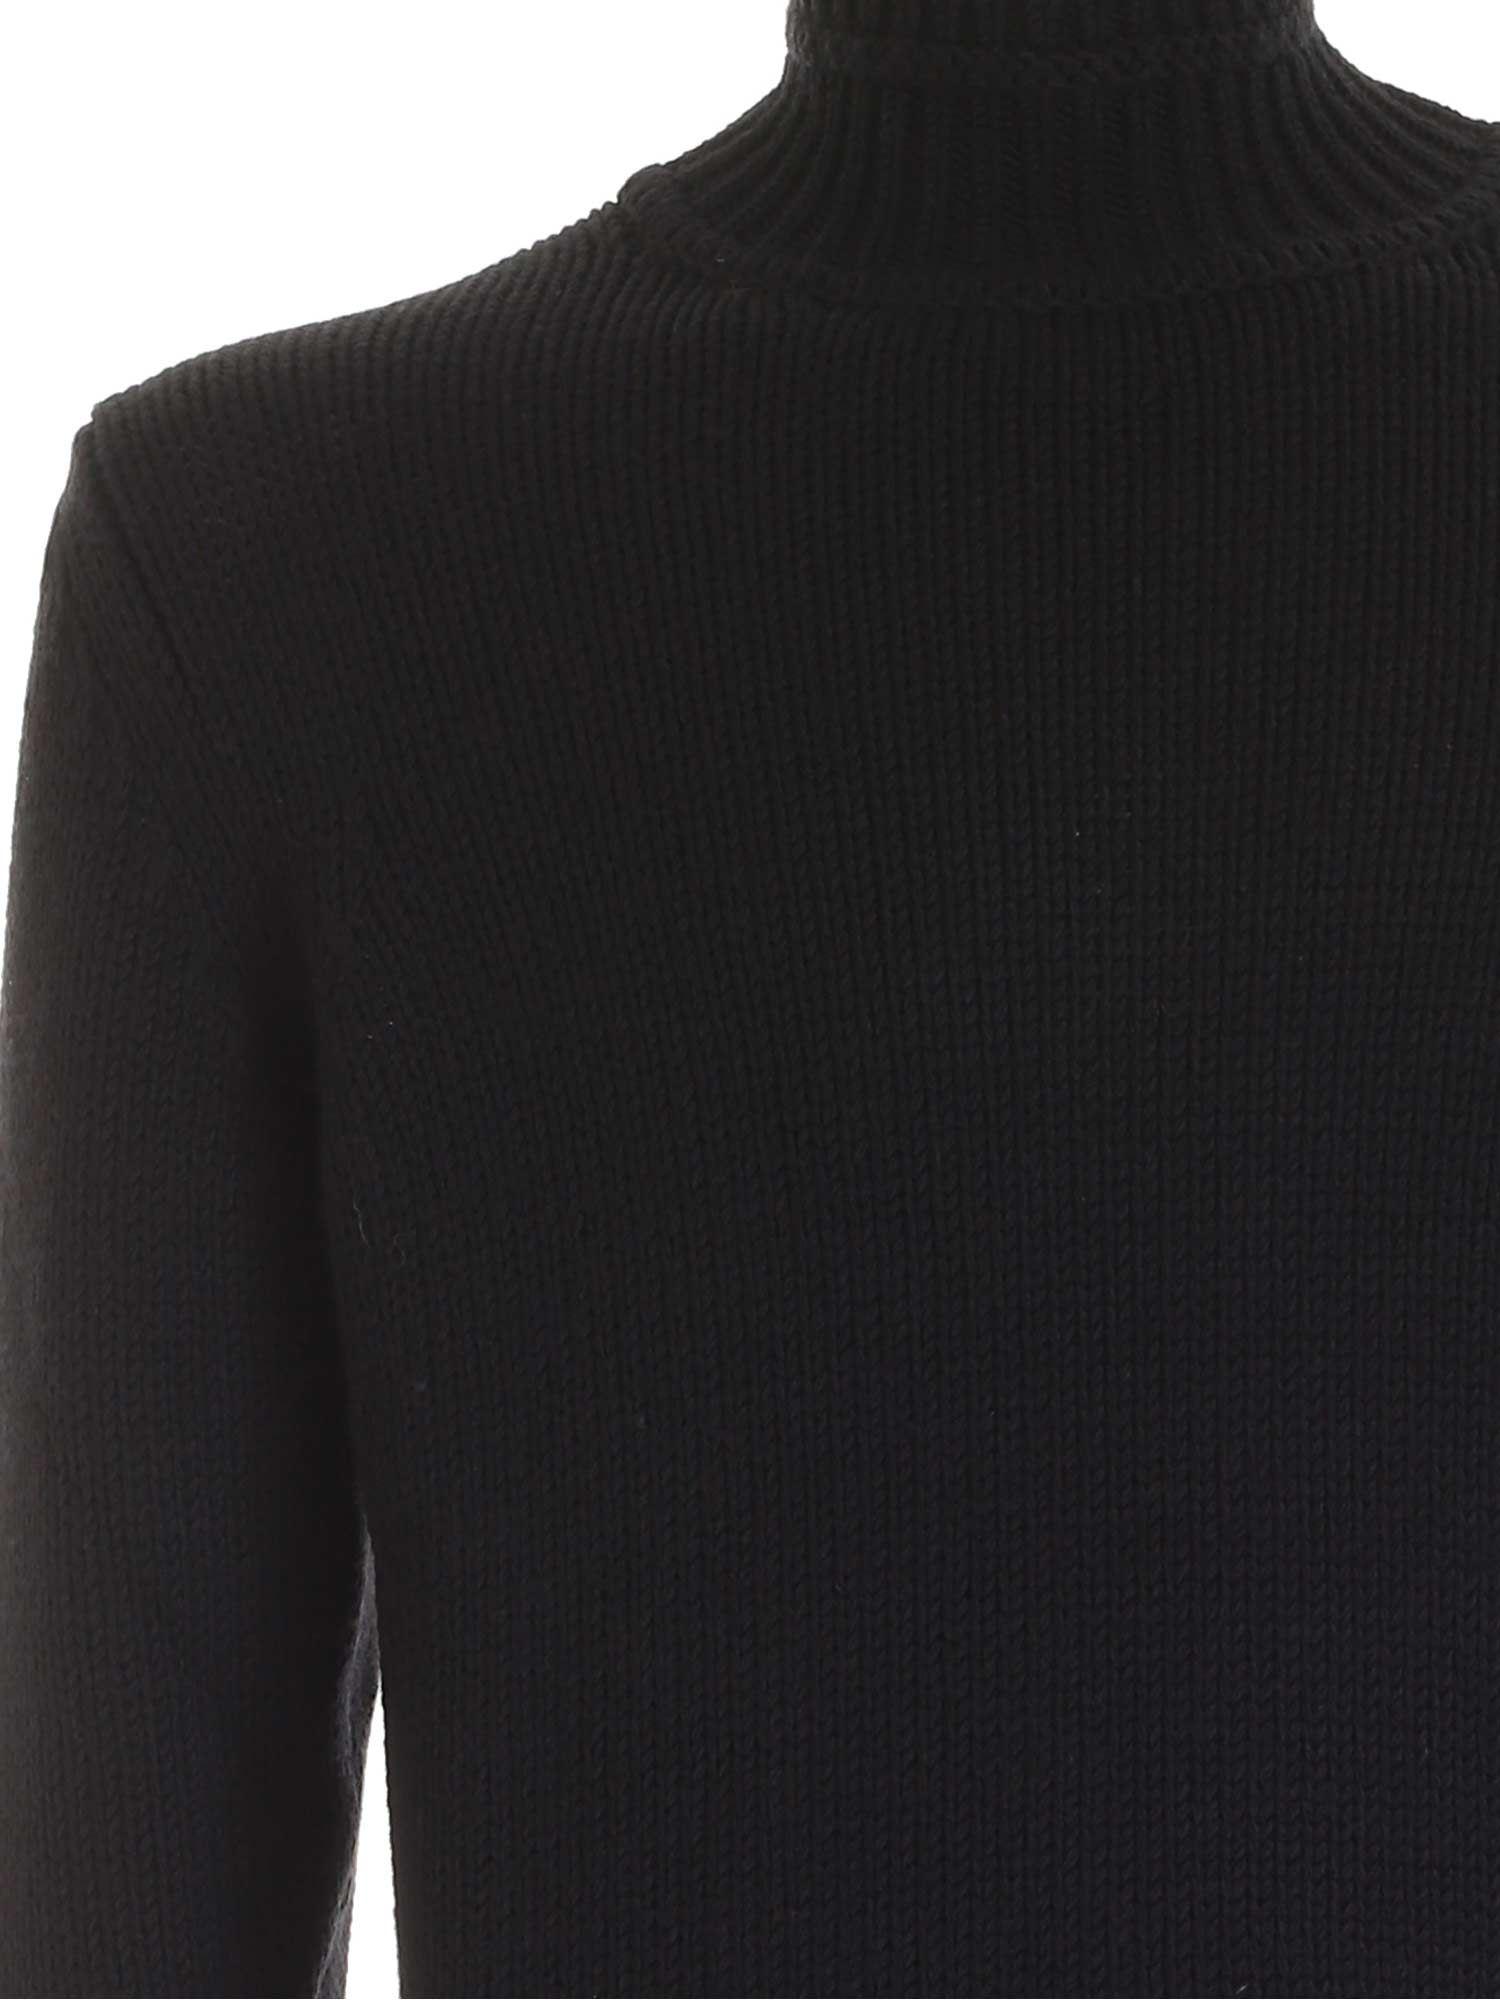 KNITTED TURTLENECK IN BLACK DONDUP | 10000016 | UT031M00725U002DU999